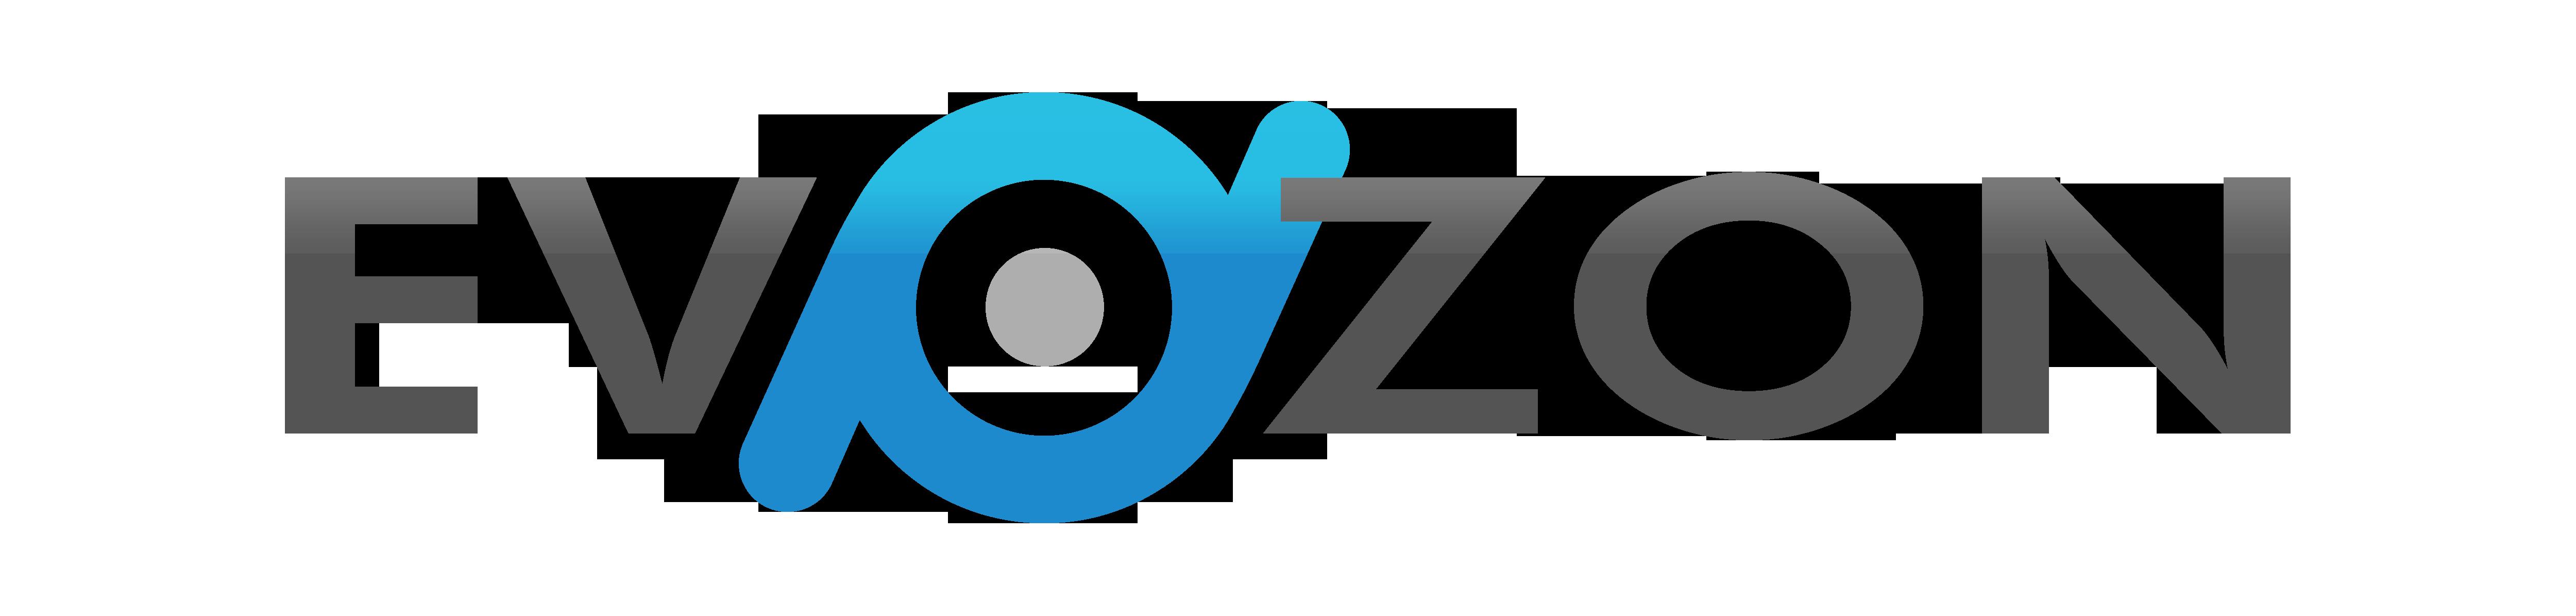 SAP Hybris Commerce Solutions - About Evozon